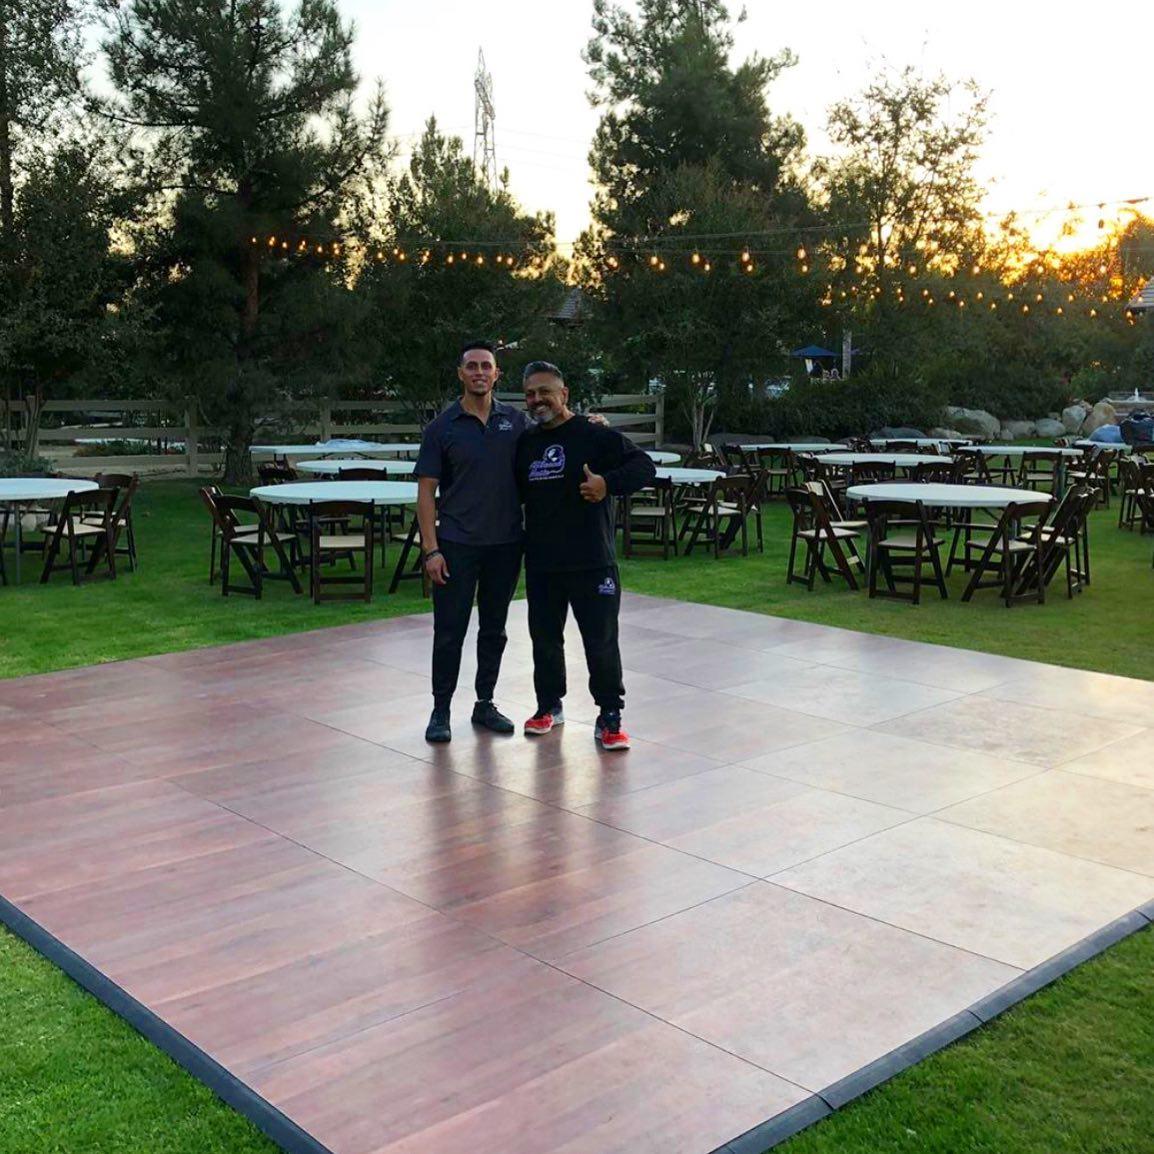 ASMDancefloors are ready for their customer's special event with SnapLock Plus Dark Maple flooring.